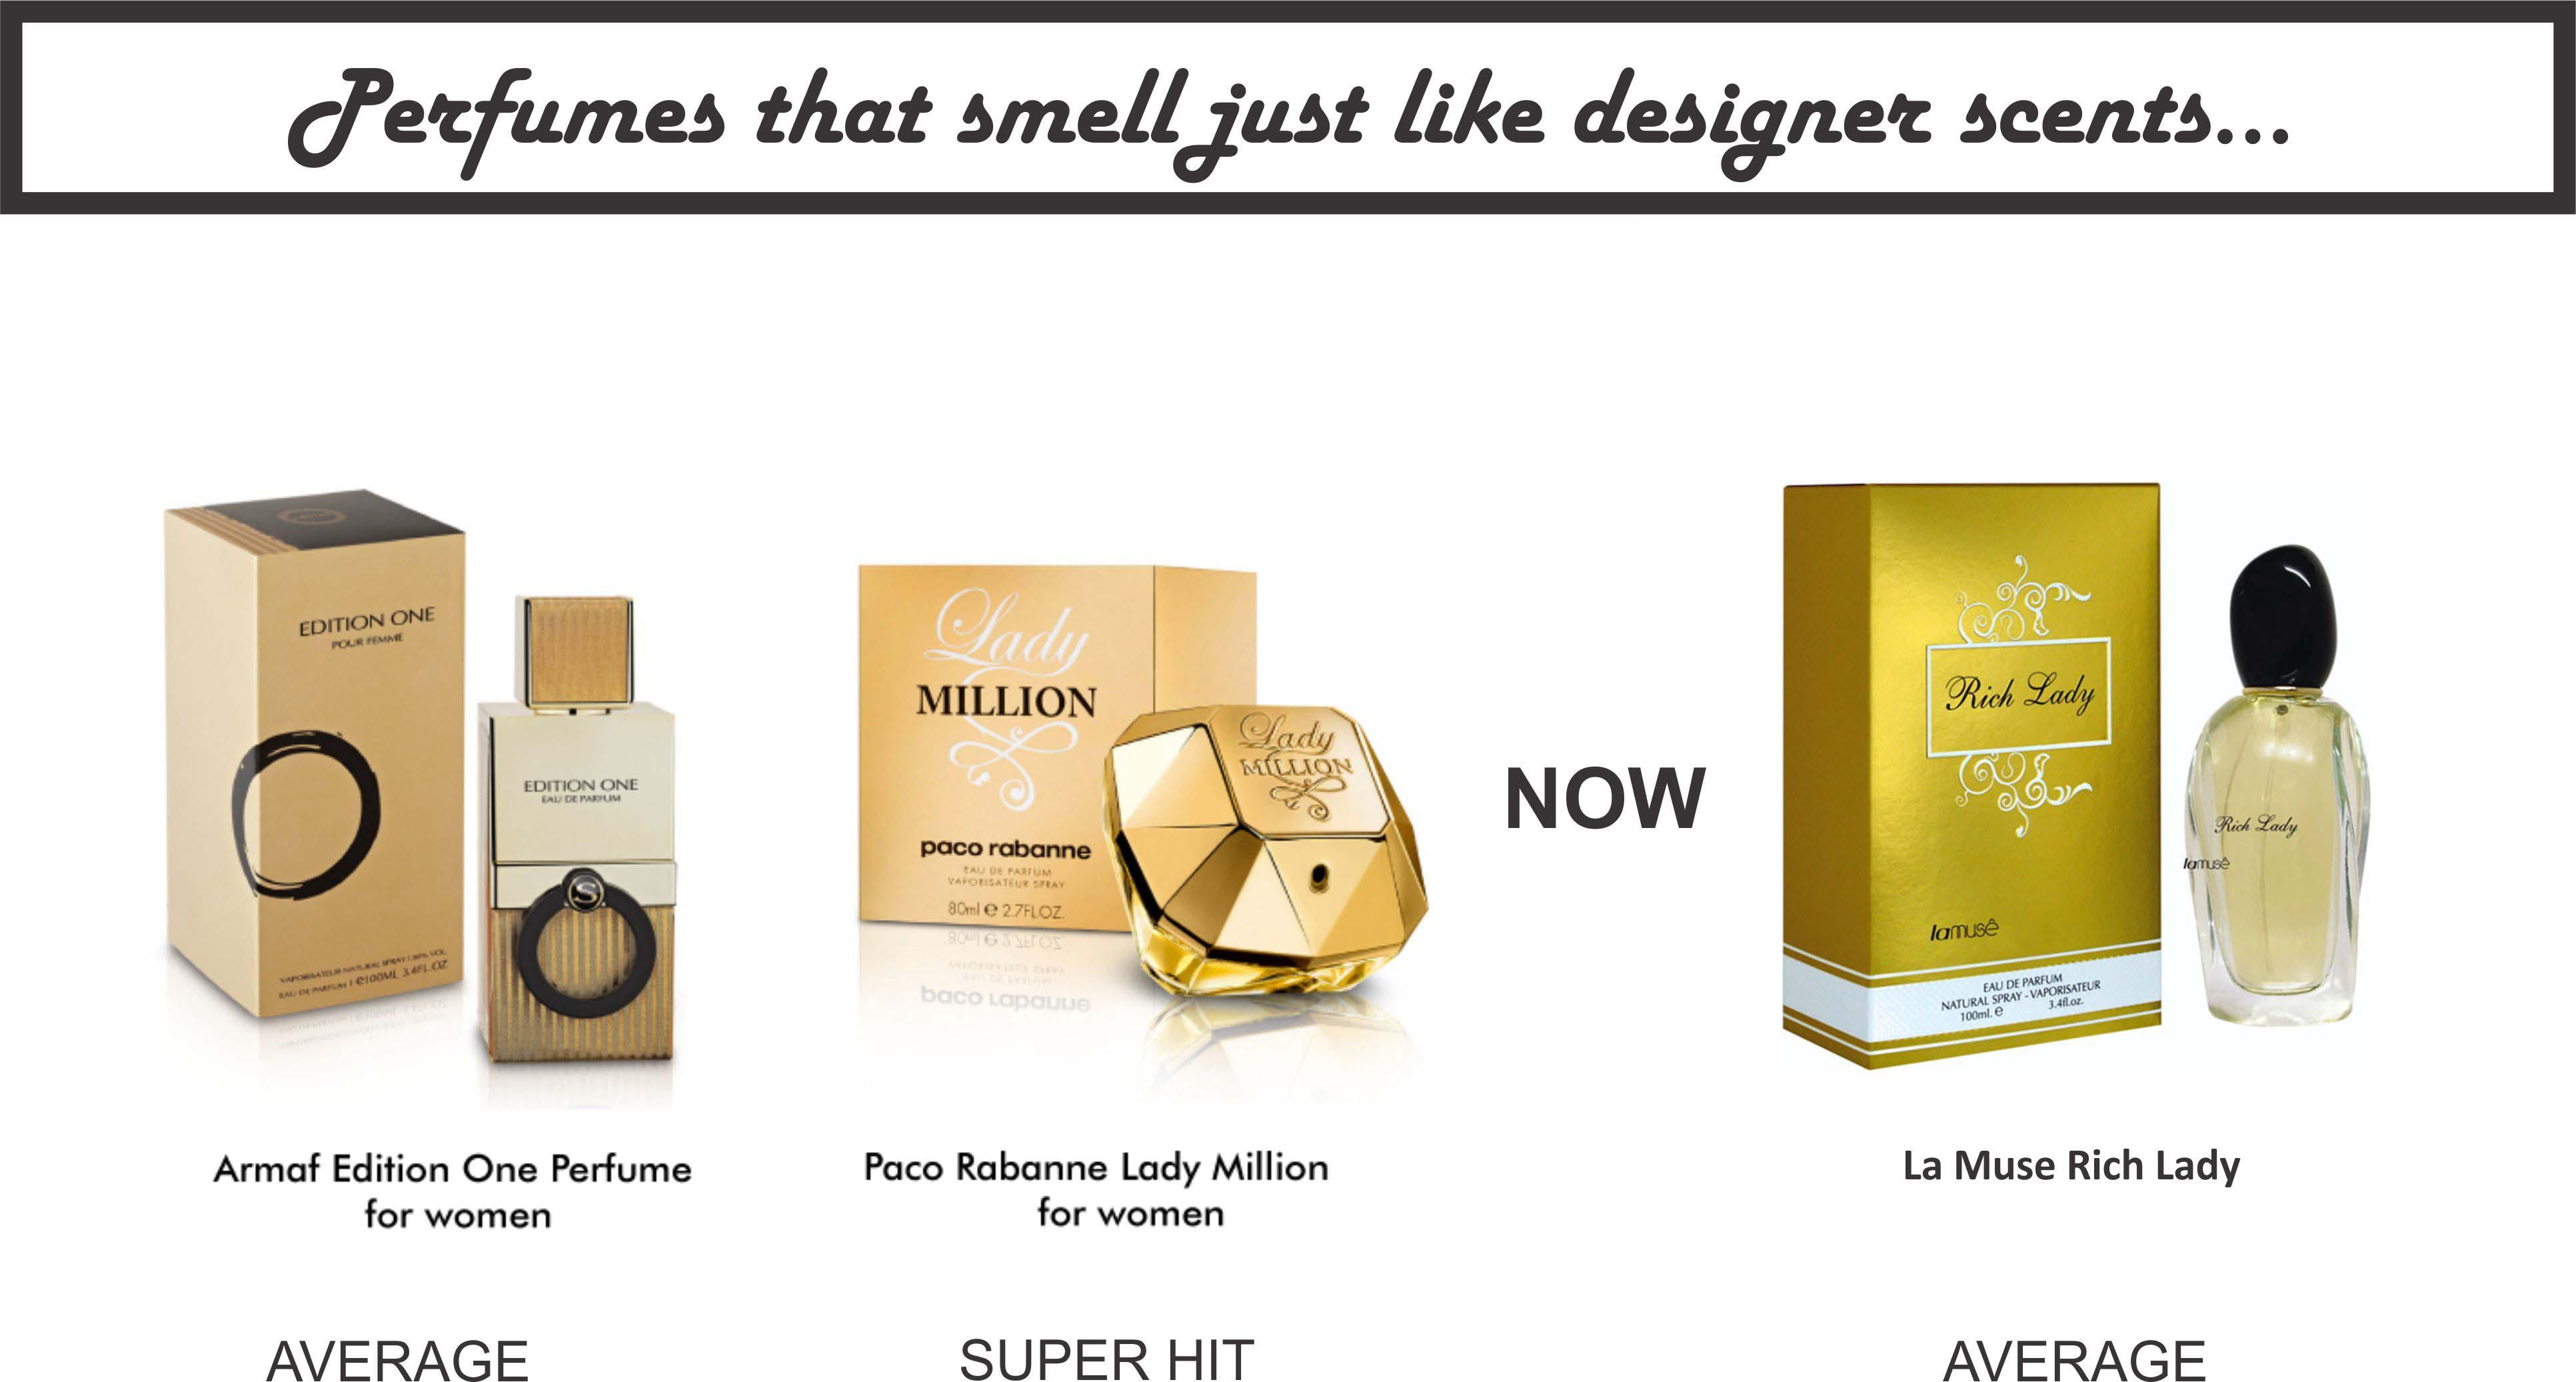 armaf-edition-one-perfume-paco-rabanne-lady-million-la-muse-rich-lady-for-women-100-ml-edp-by-lattafa-perfumes